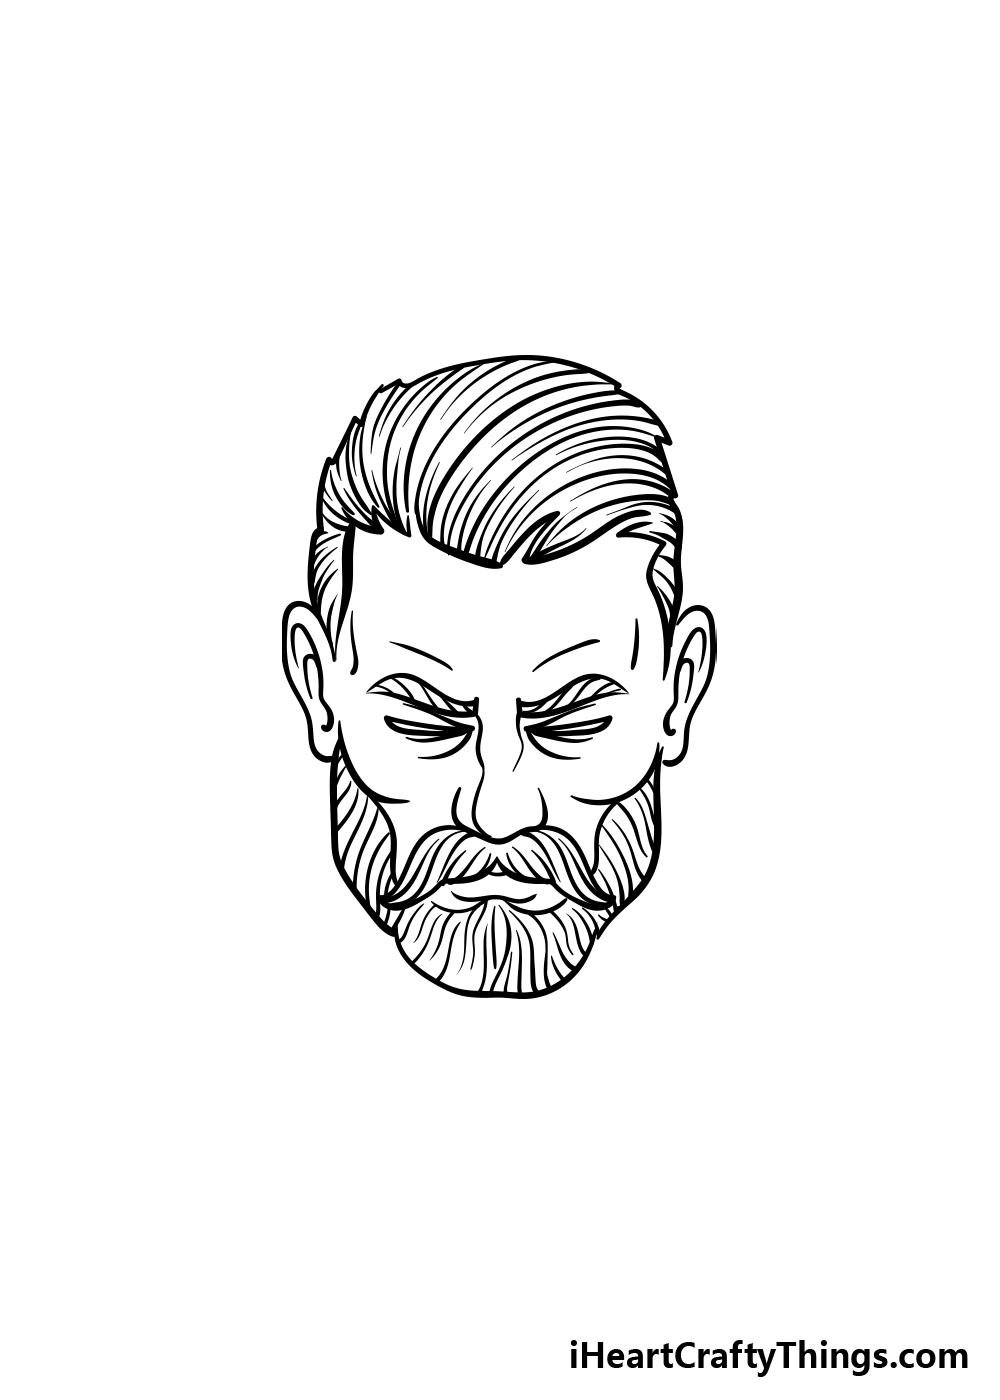 drawing a beard step 5